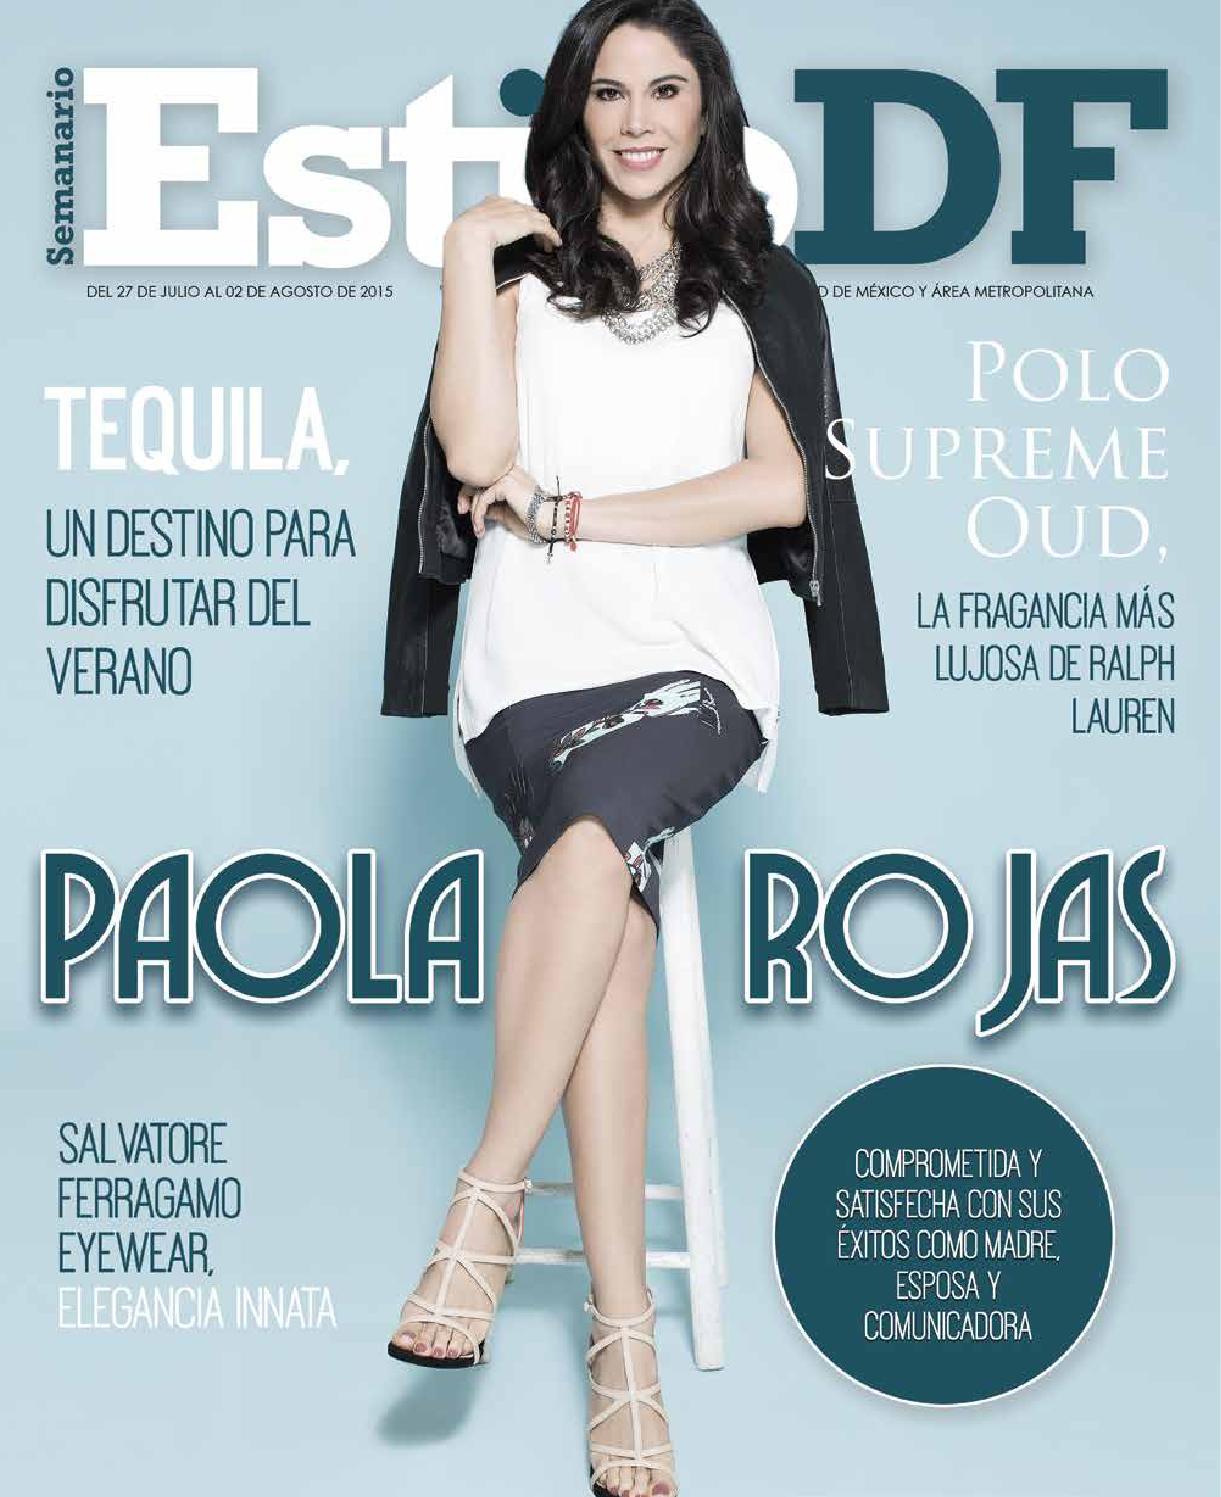 7037c3e7d EstiloDF Paola Rojas 27 de julio by EstiloDF - issuu